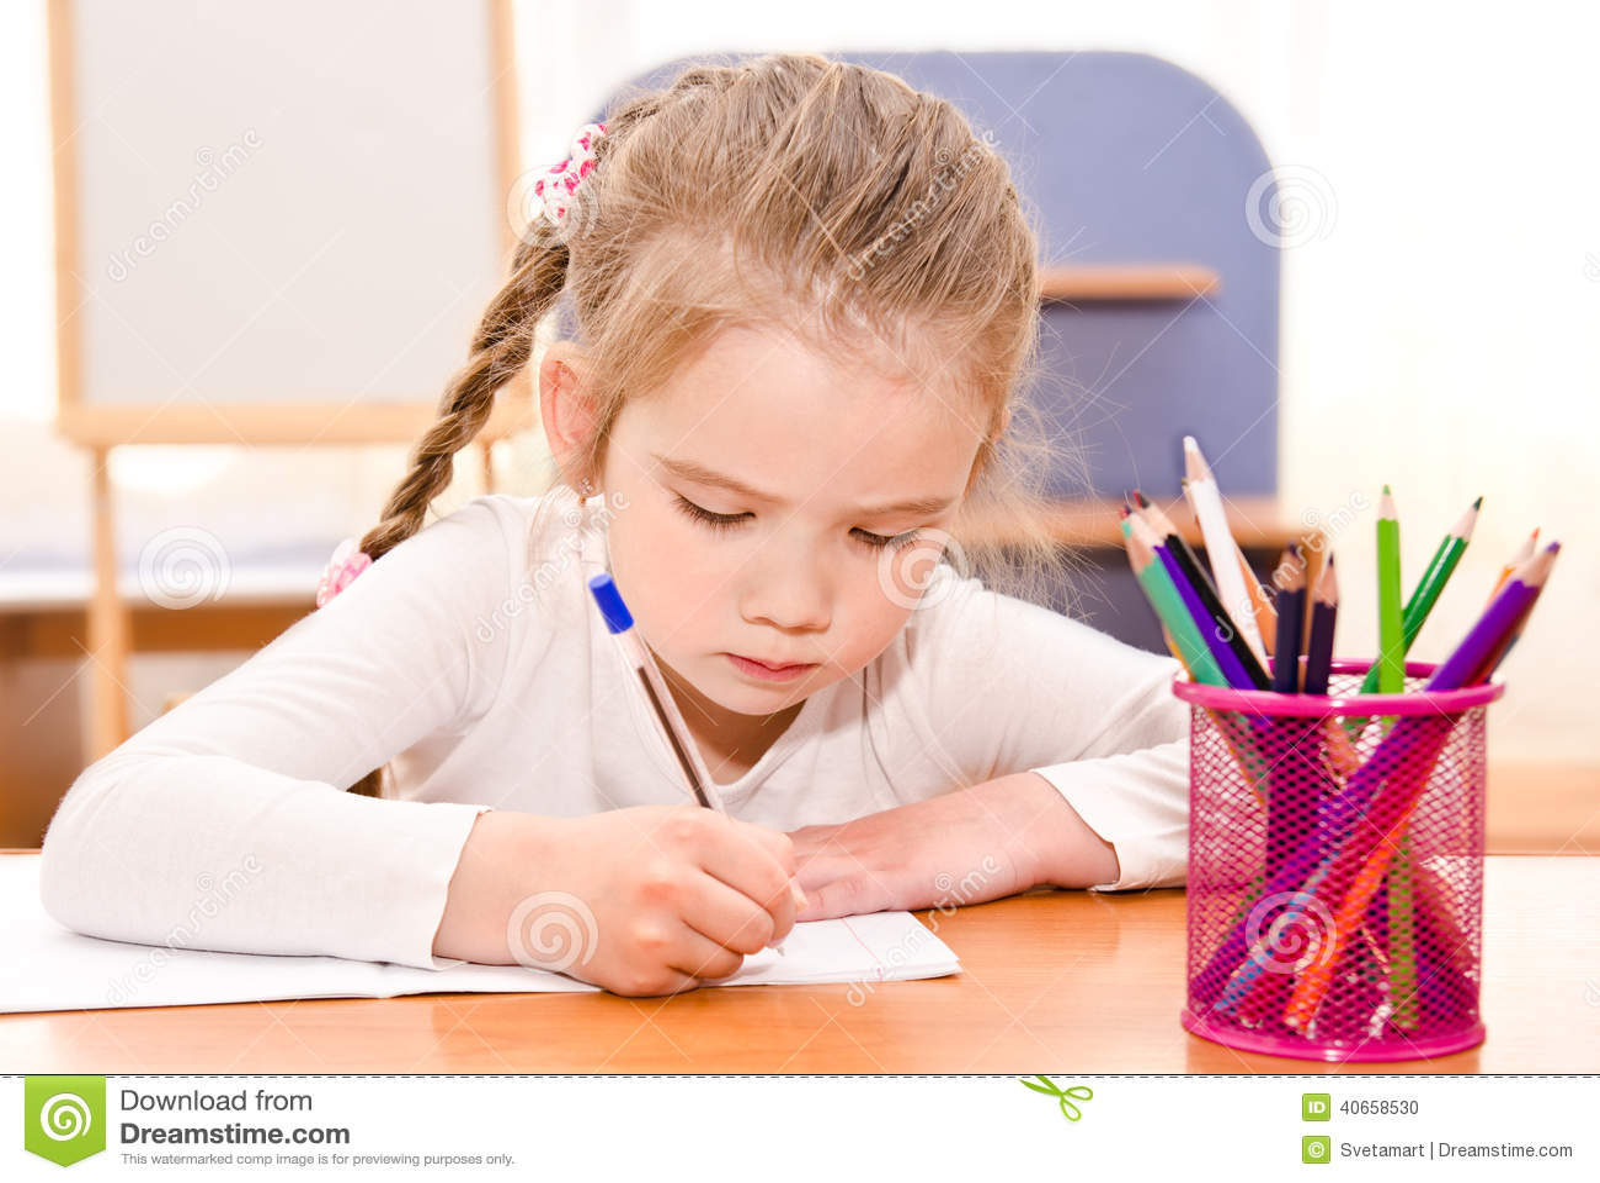 girls writing desk Find affordable desks for girls bedrooms online choose from girls desk styles for studying, writing, computers, artwork & more black, white & color options.